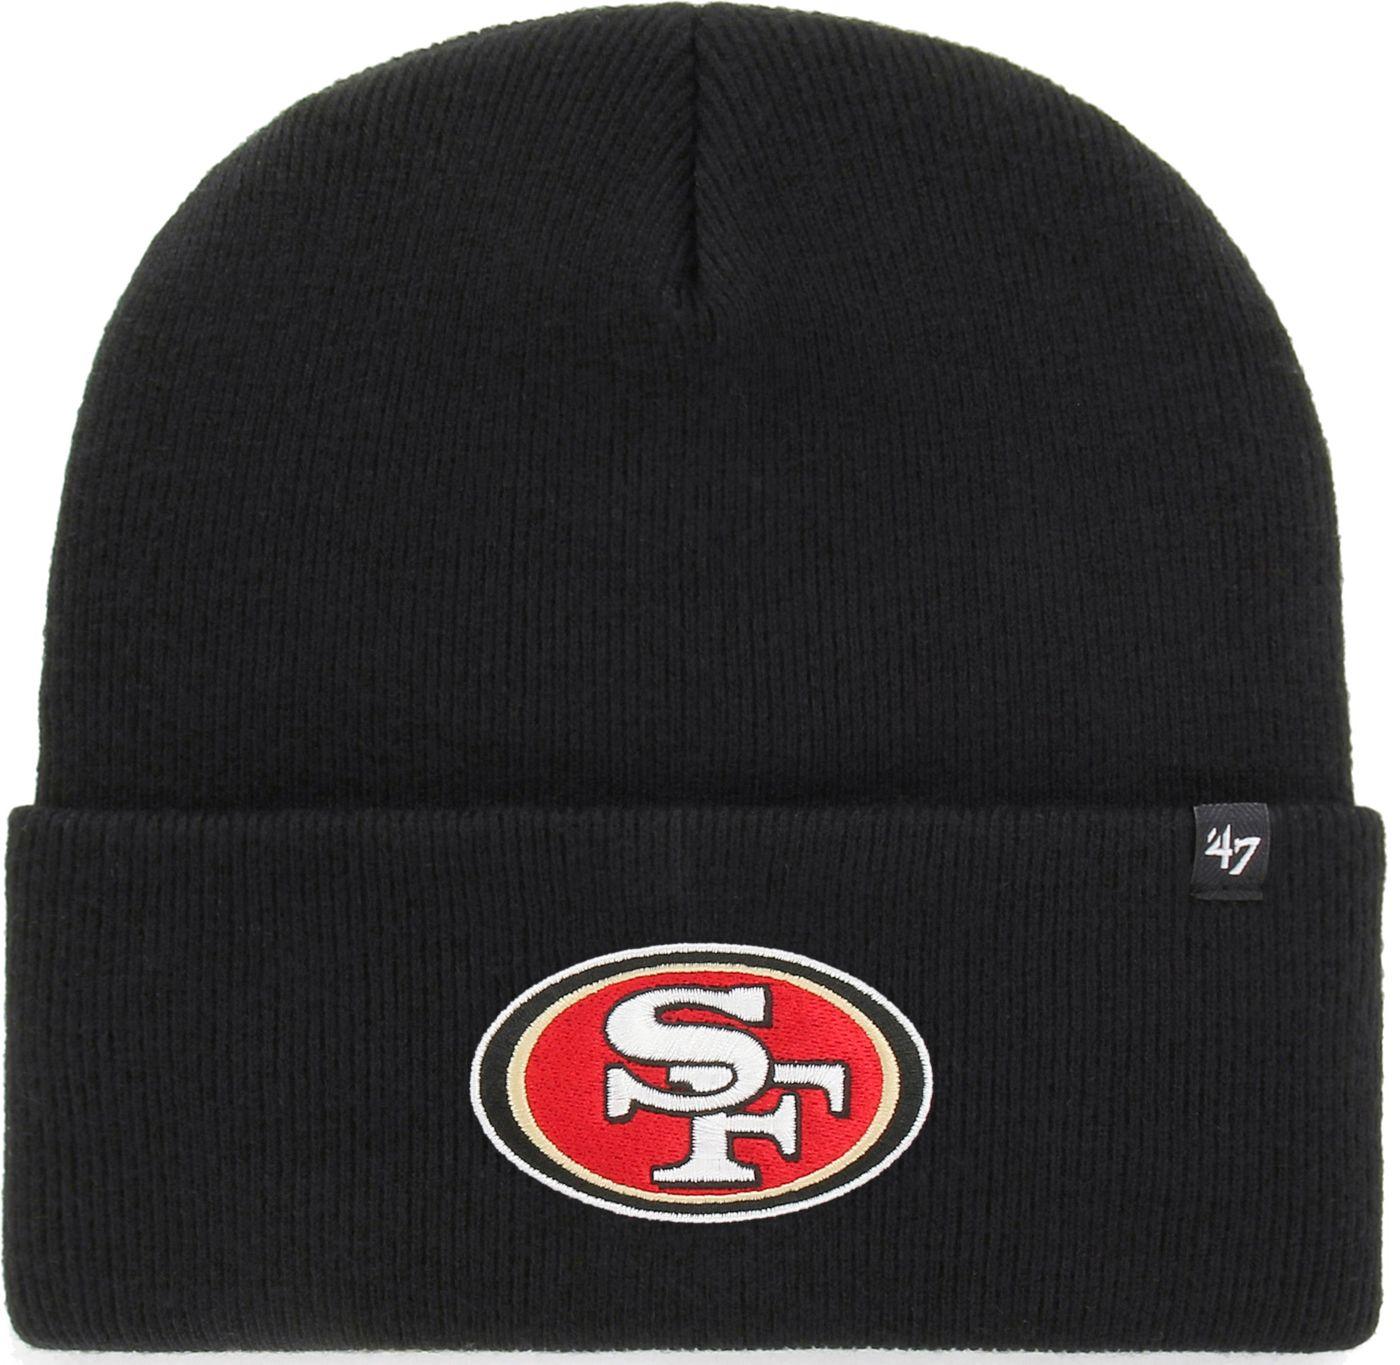 '47 Men's San Francisco 49ers Carhartt Black Knit Hat